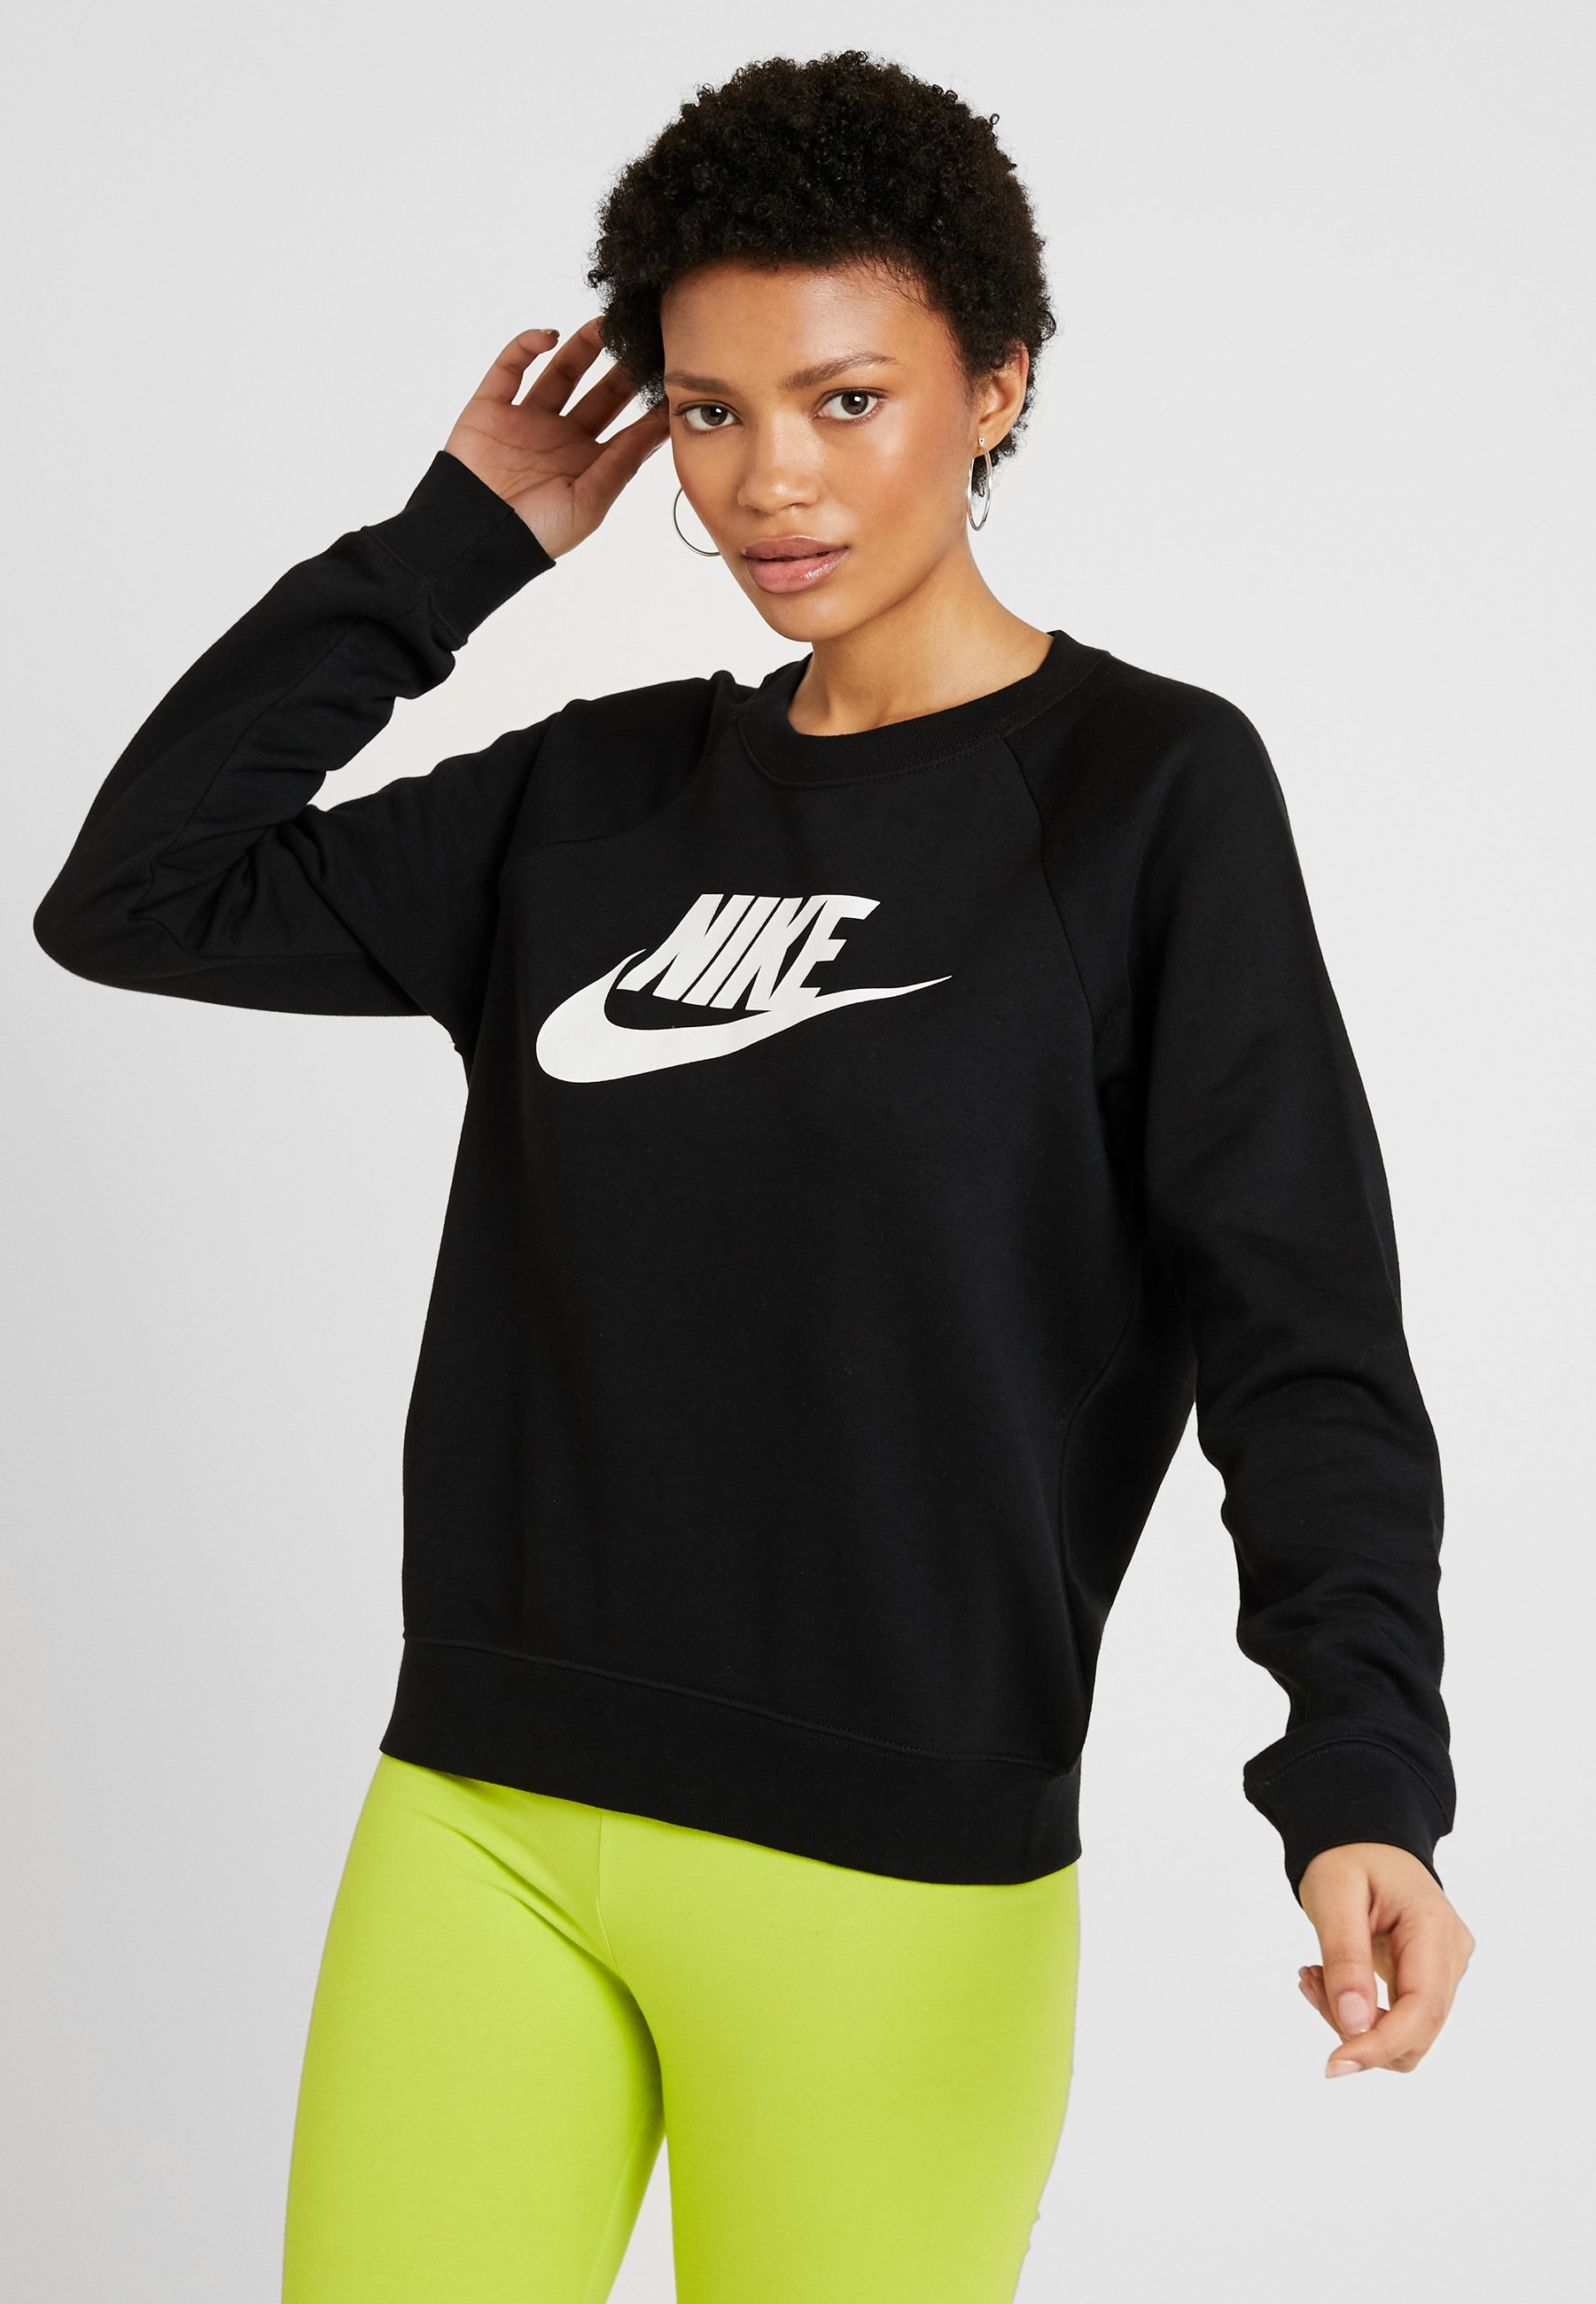 CrewSweatshirt Nike Nike CrewSweatshirt Black Black Sportswear white Sportswear white 3S5ARj4cLq